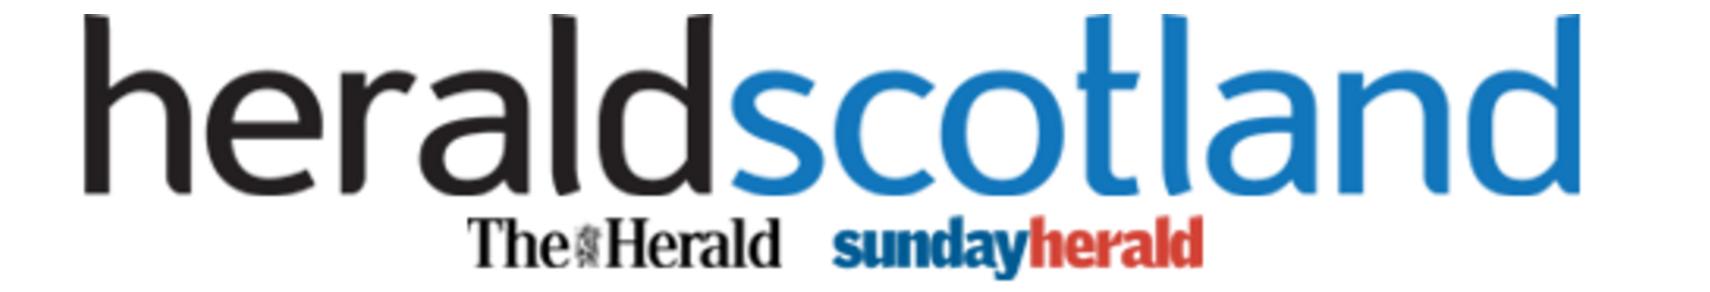 Herald_scotland.png